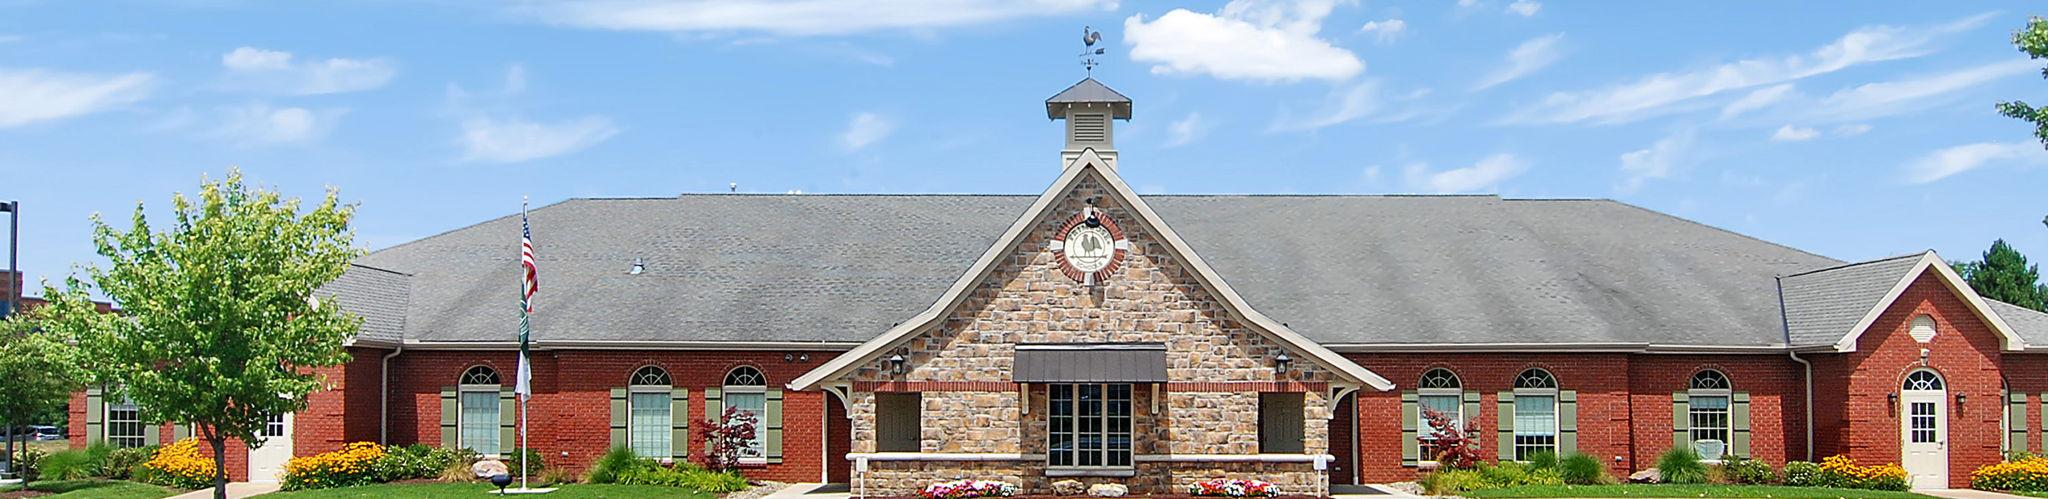 Exterior of a Primrose School of Hudson